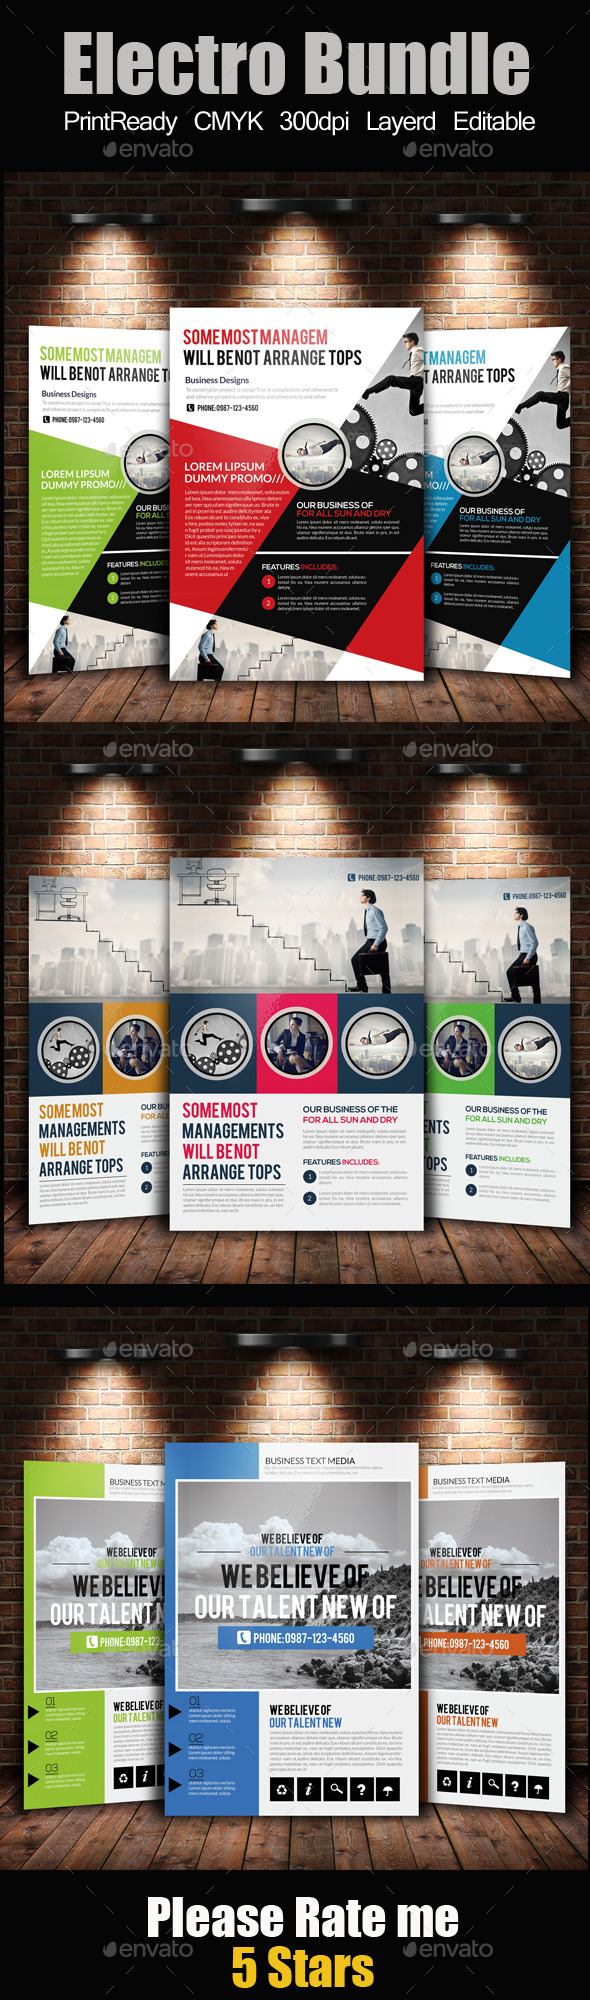 A4 Business Flyer Template Bundle - Corporate Flyers